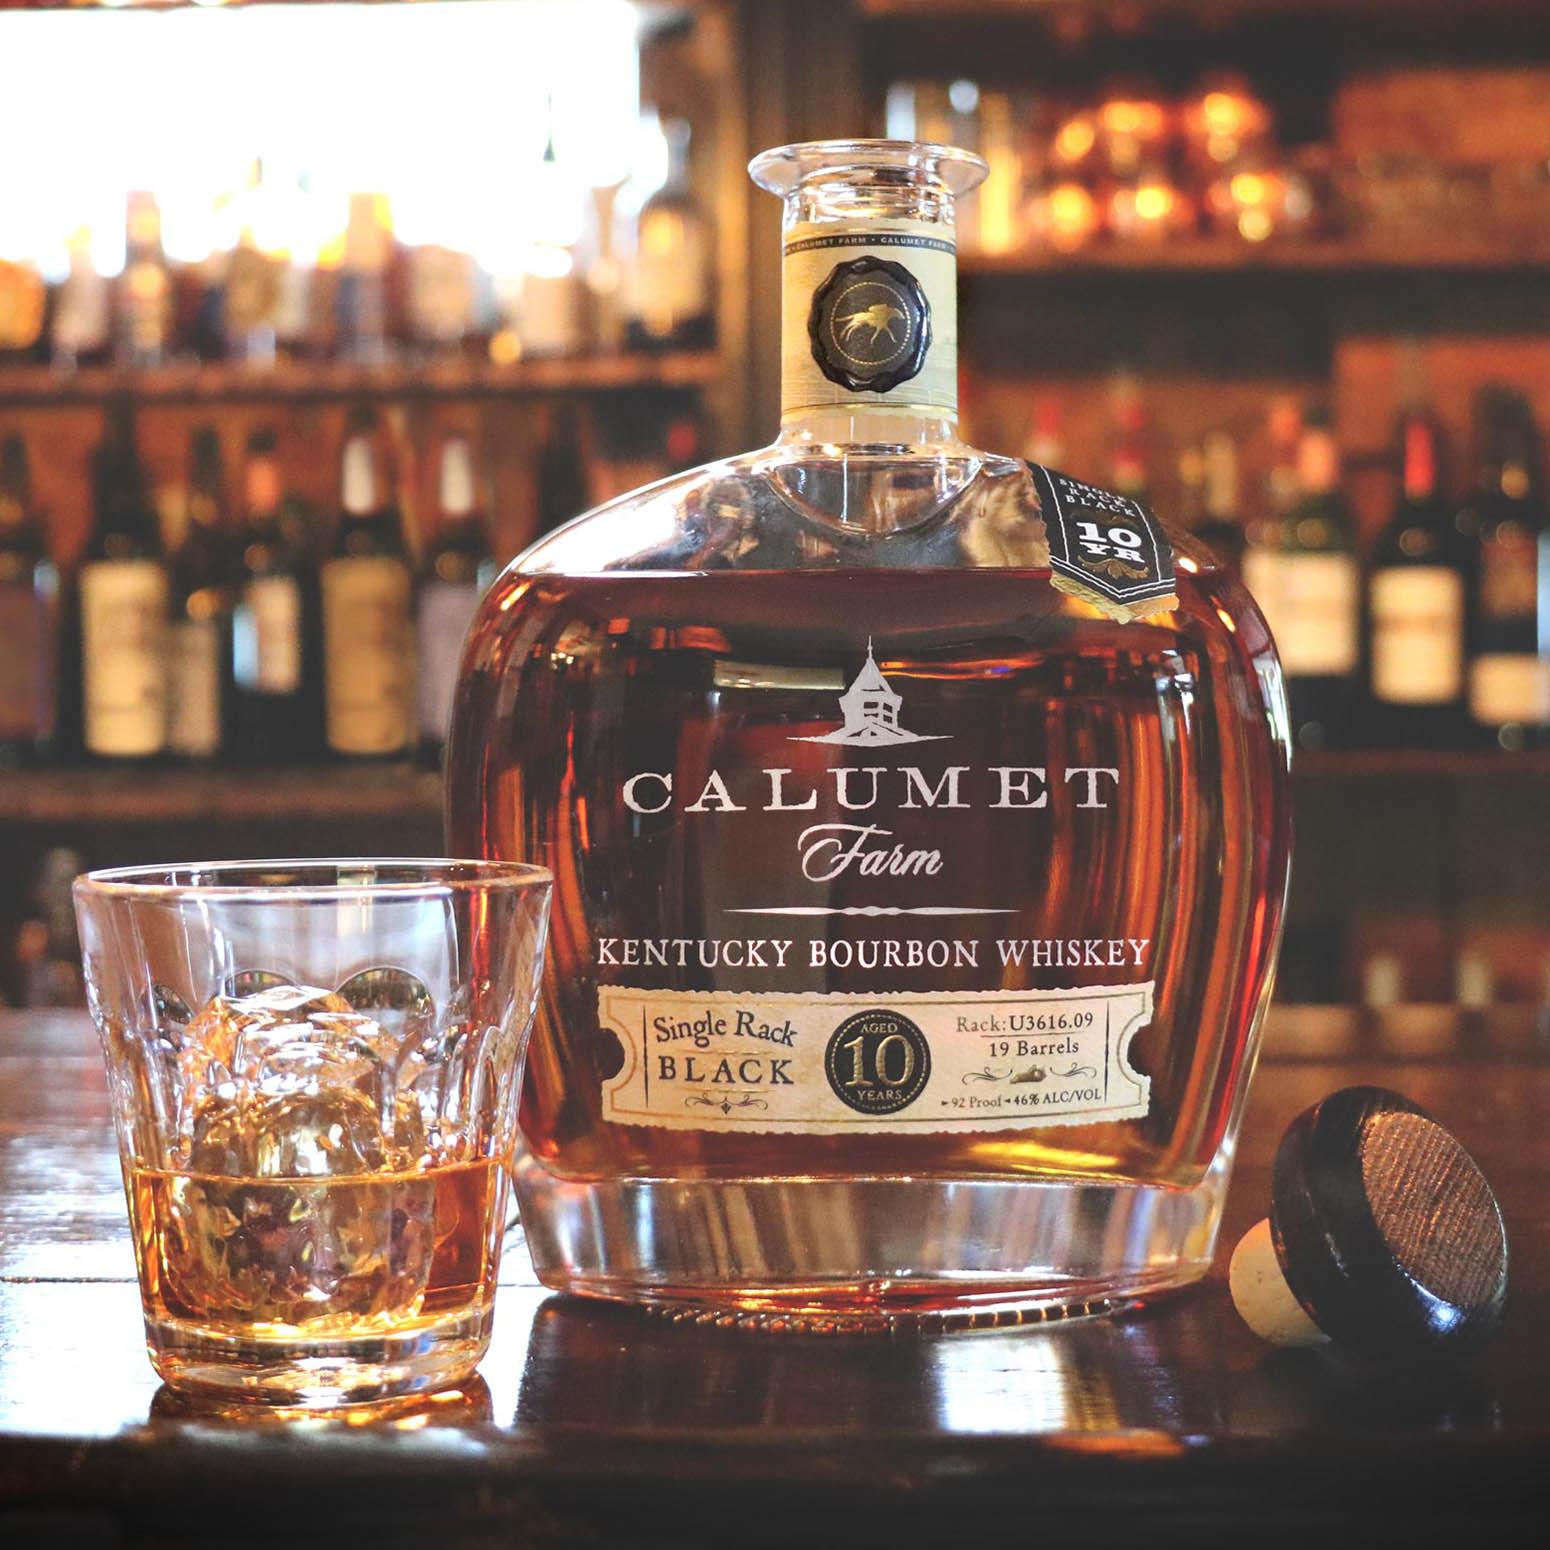 Single Rack Black with Drink - ©Calumet Farm Bourbon Whiskey